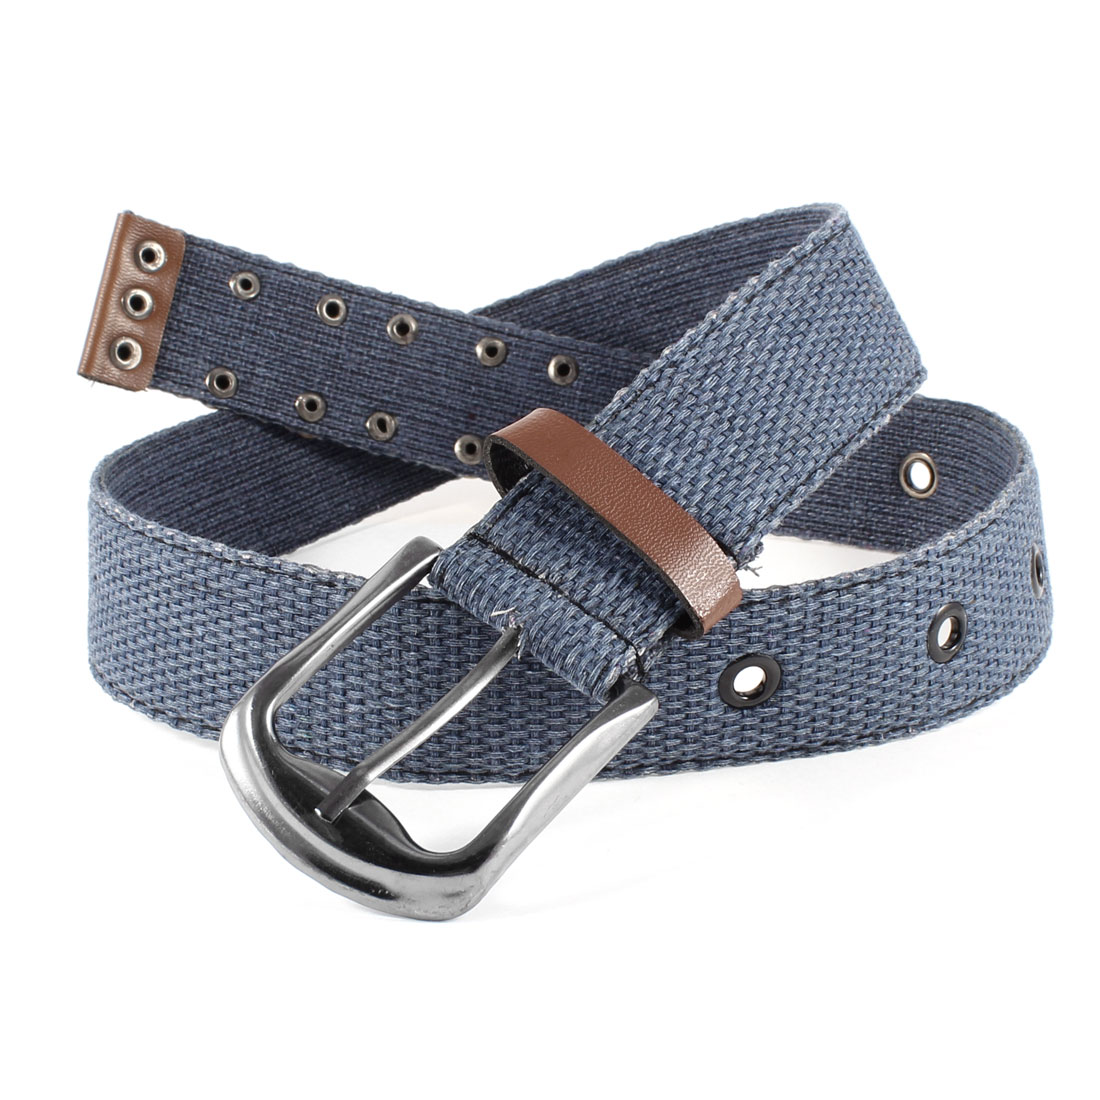 Unisex Textured Canvas Single Pin Buckle 4cm Width Jeans Belt Waist Band Navy Blue